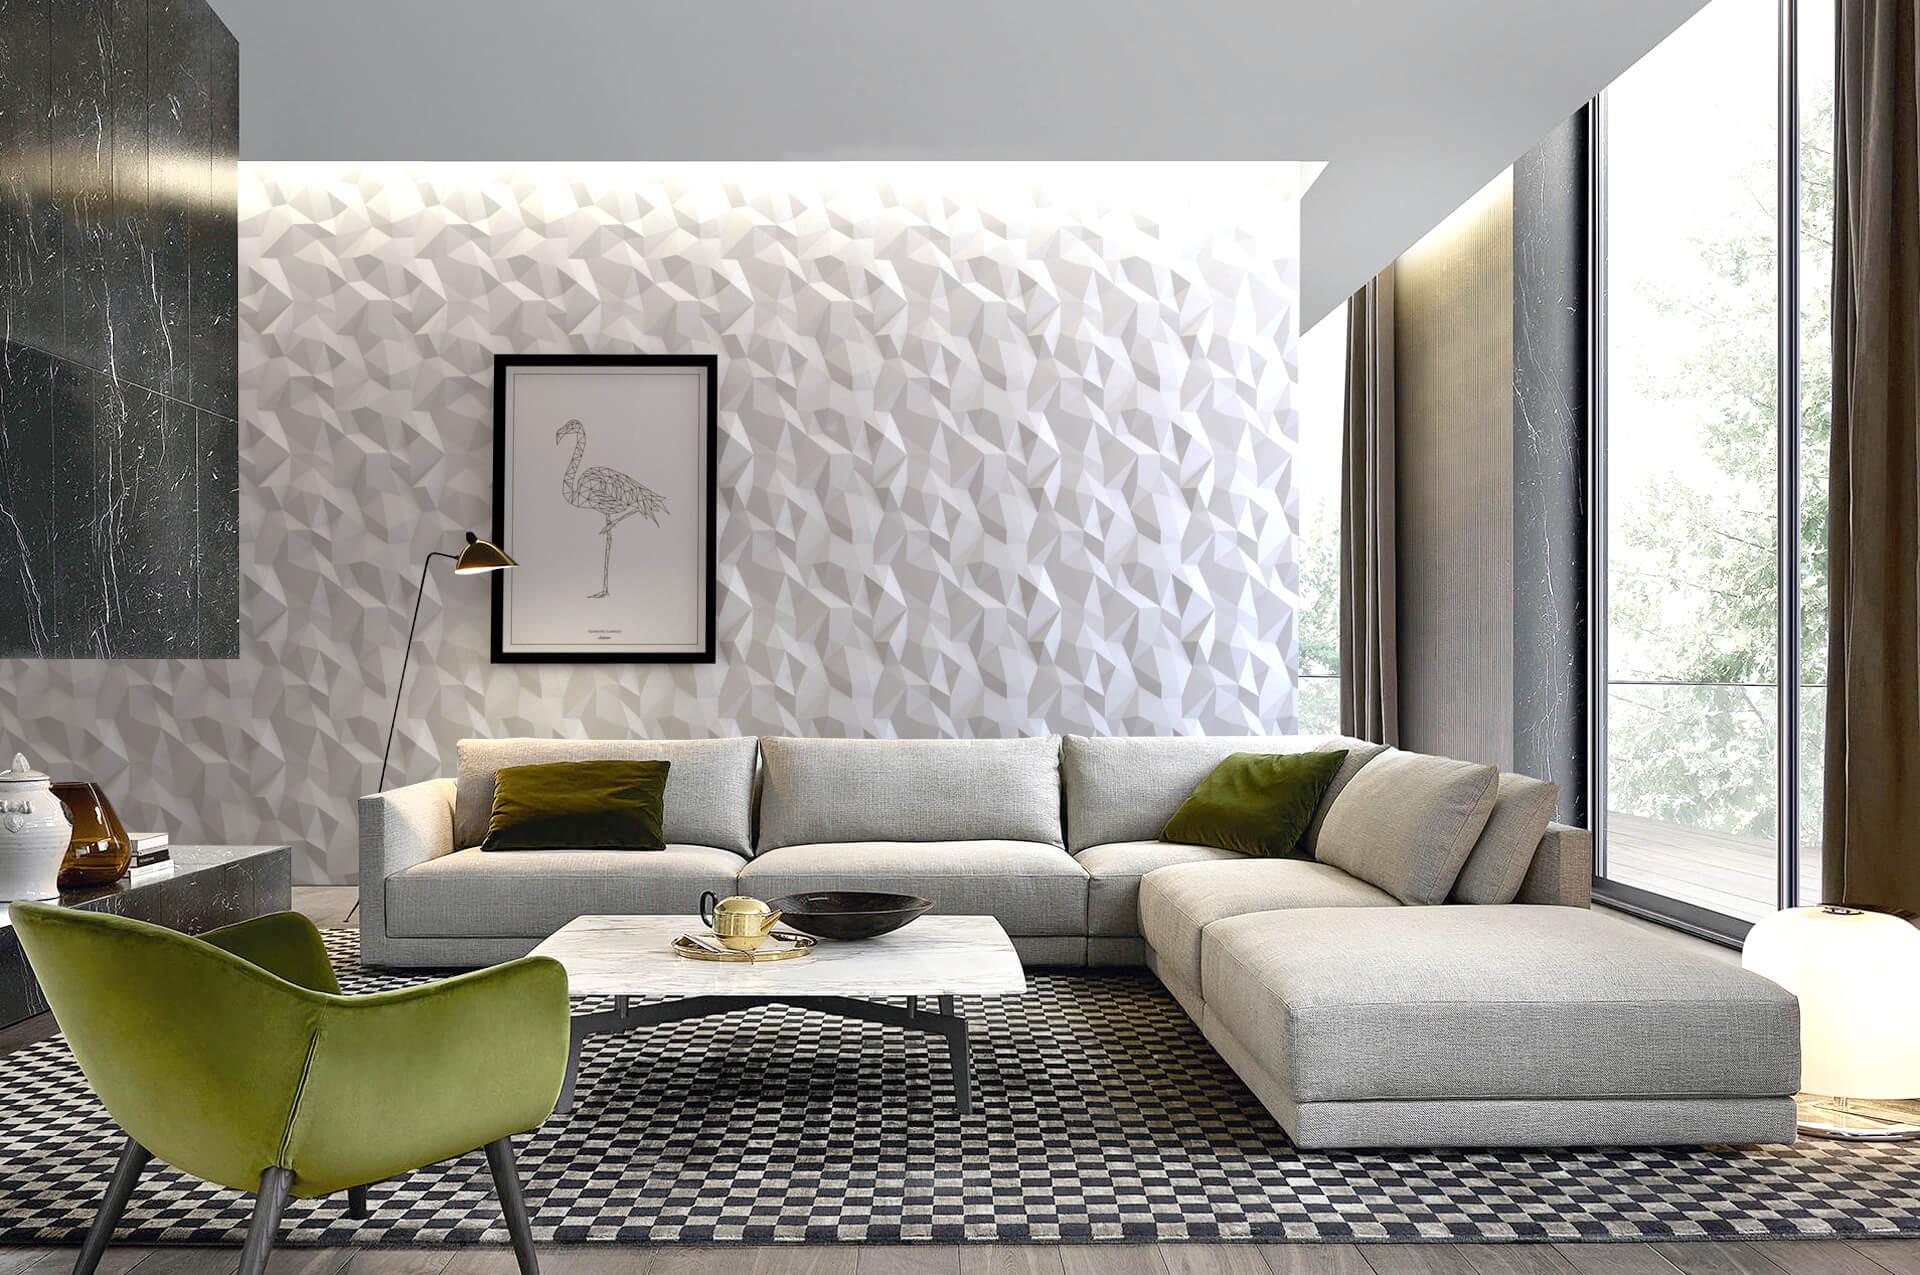 Acoustic 3D decorative wall panels